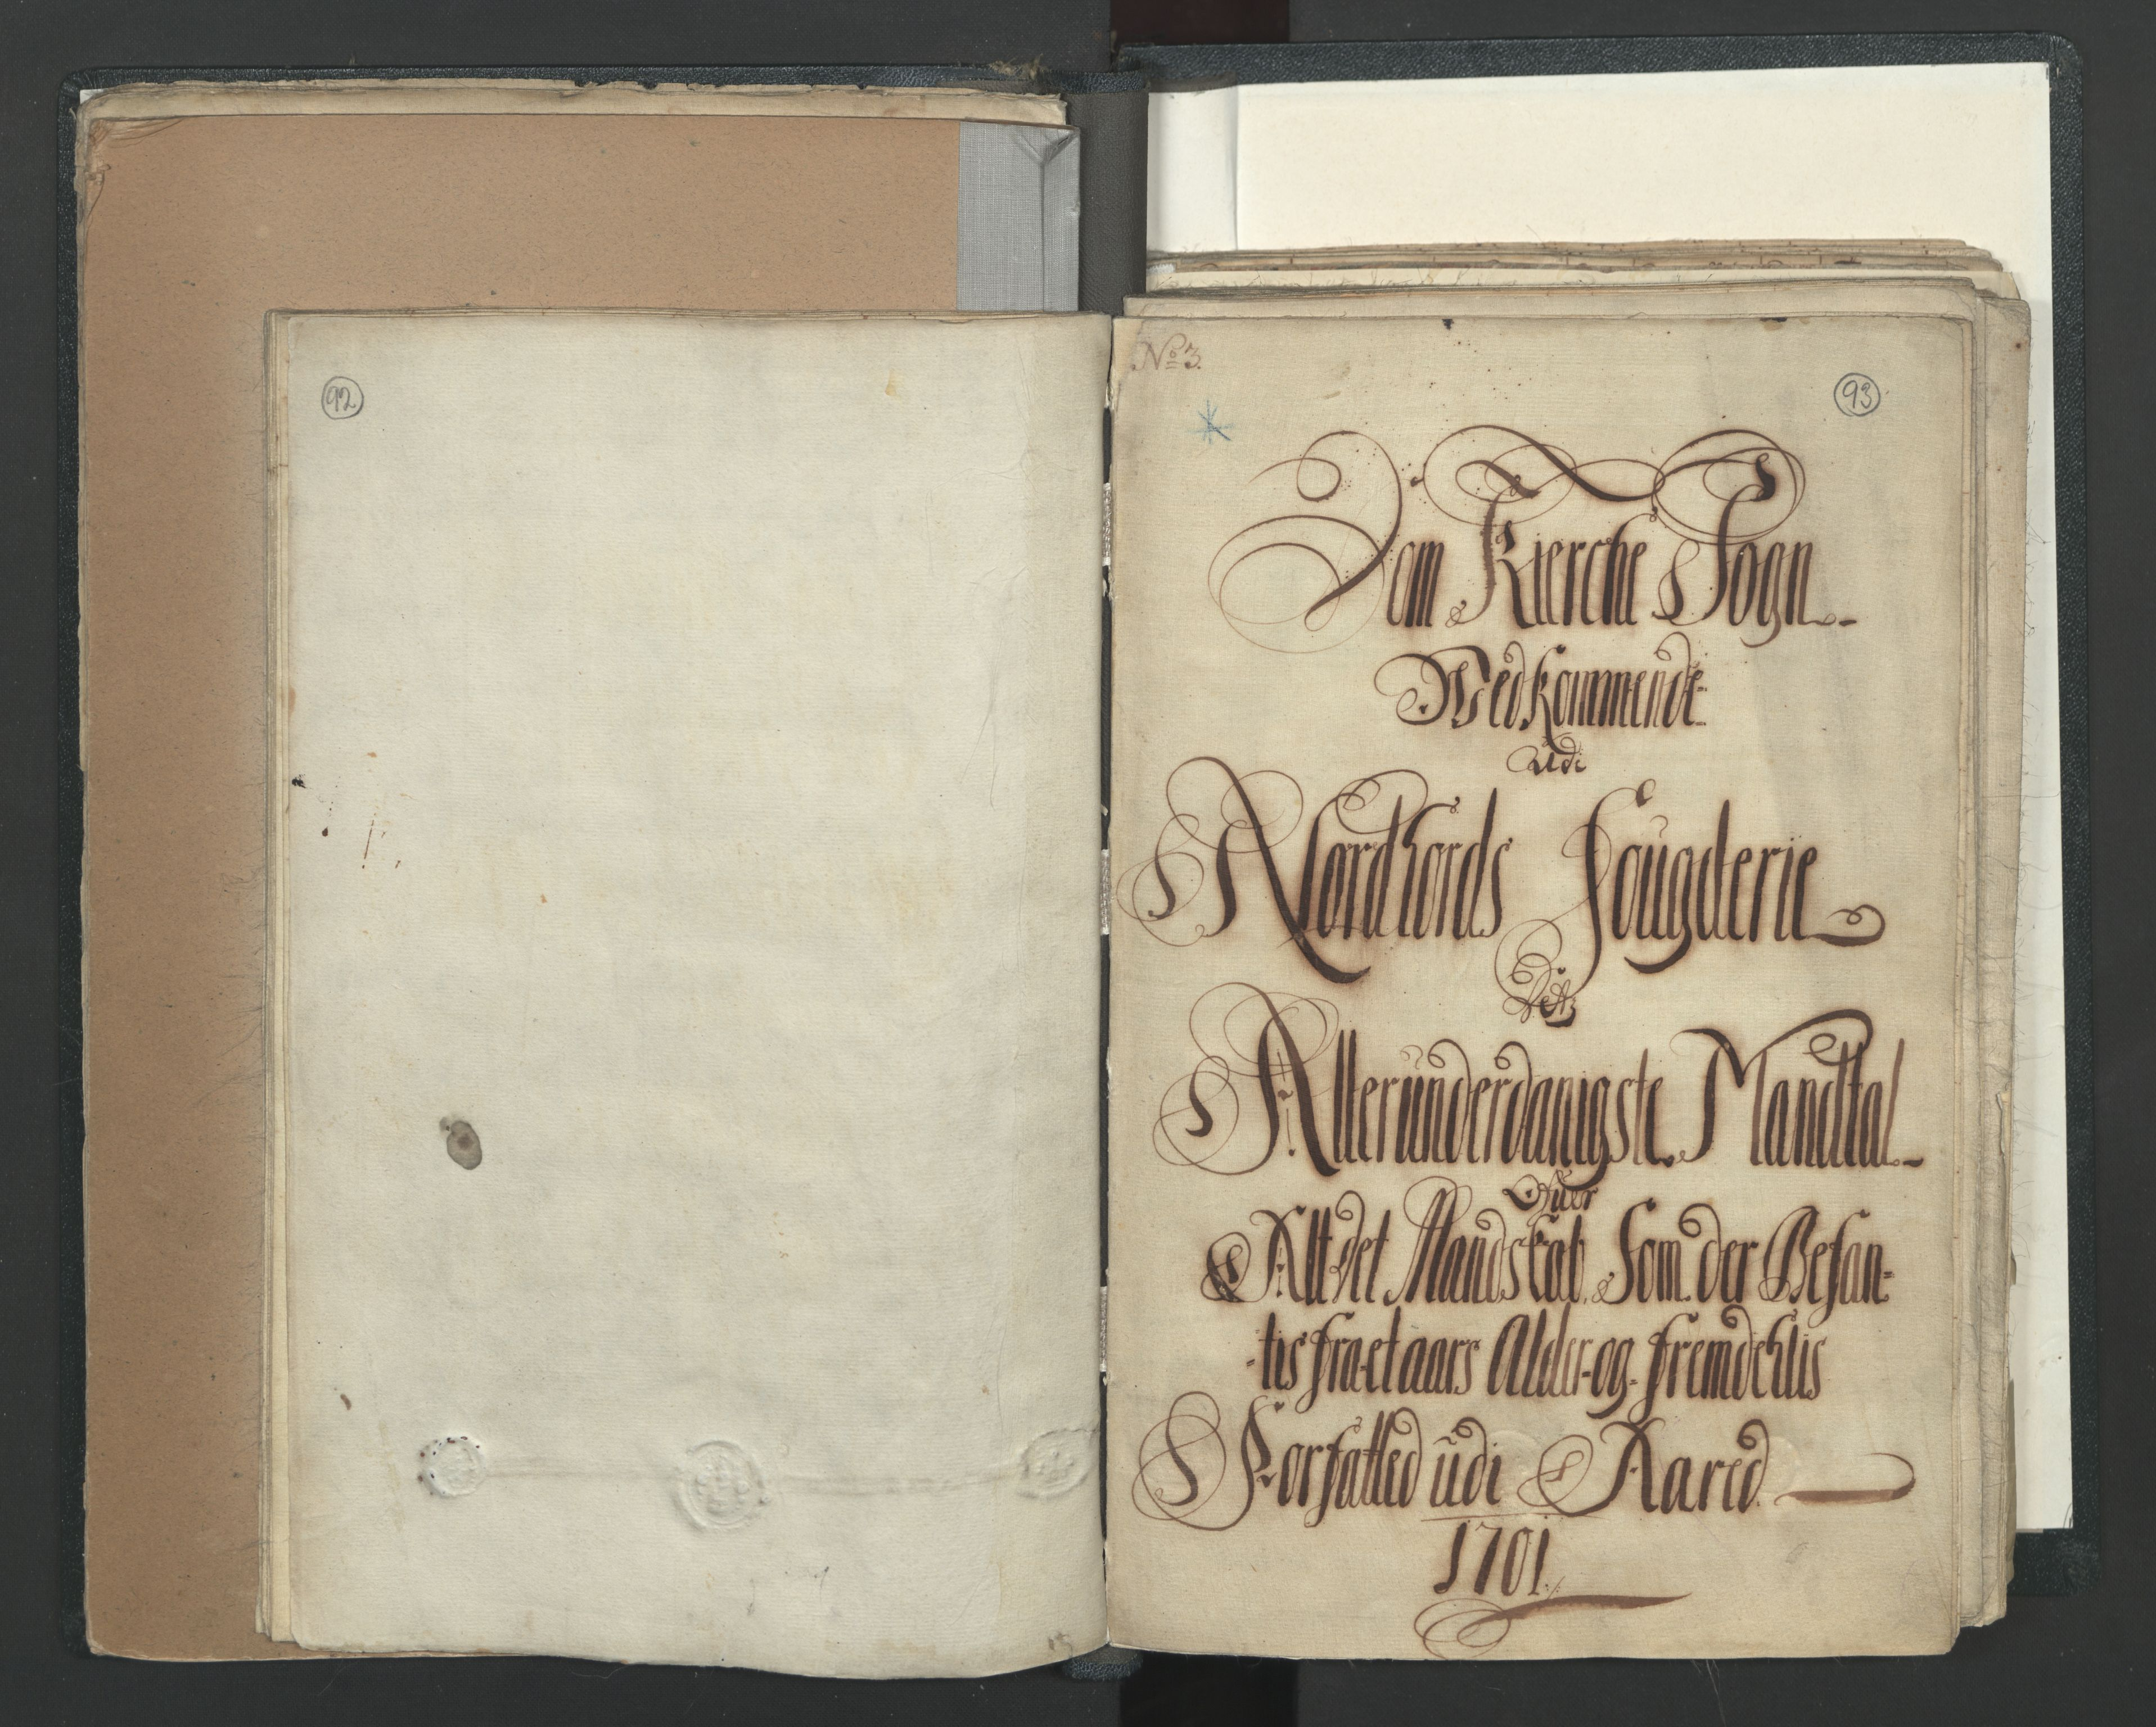 RA, Manntallet 1701, nr. 7: Nordhordland og Voss fogderi, 1701, s. 92-93